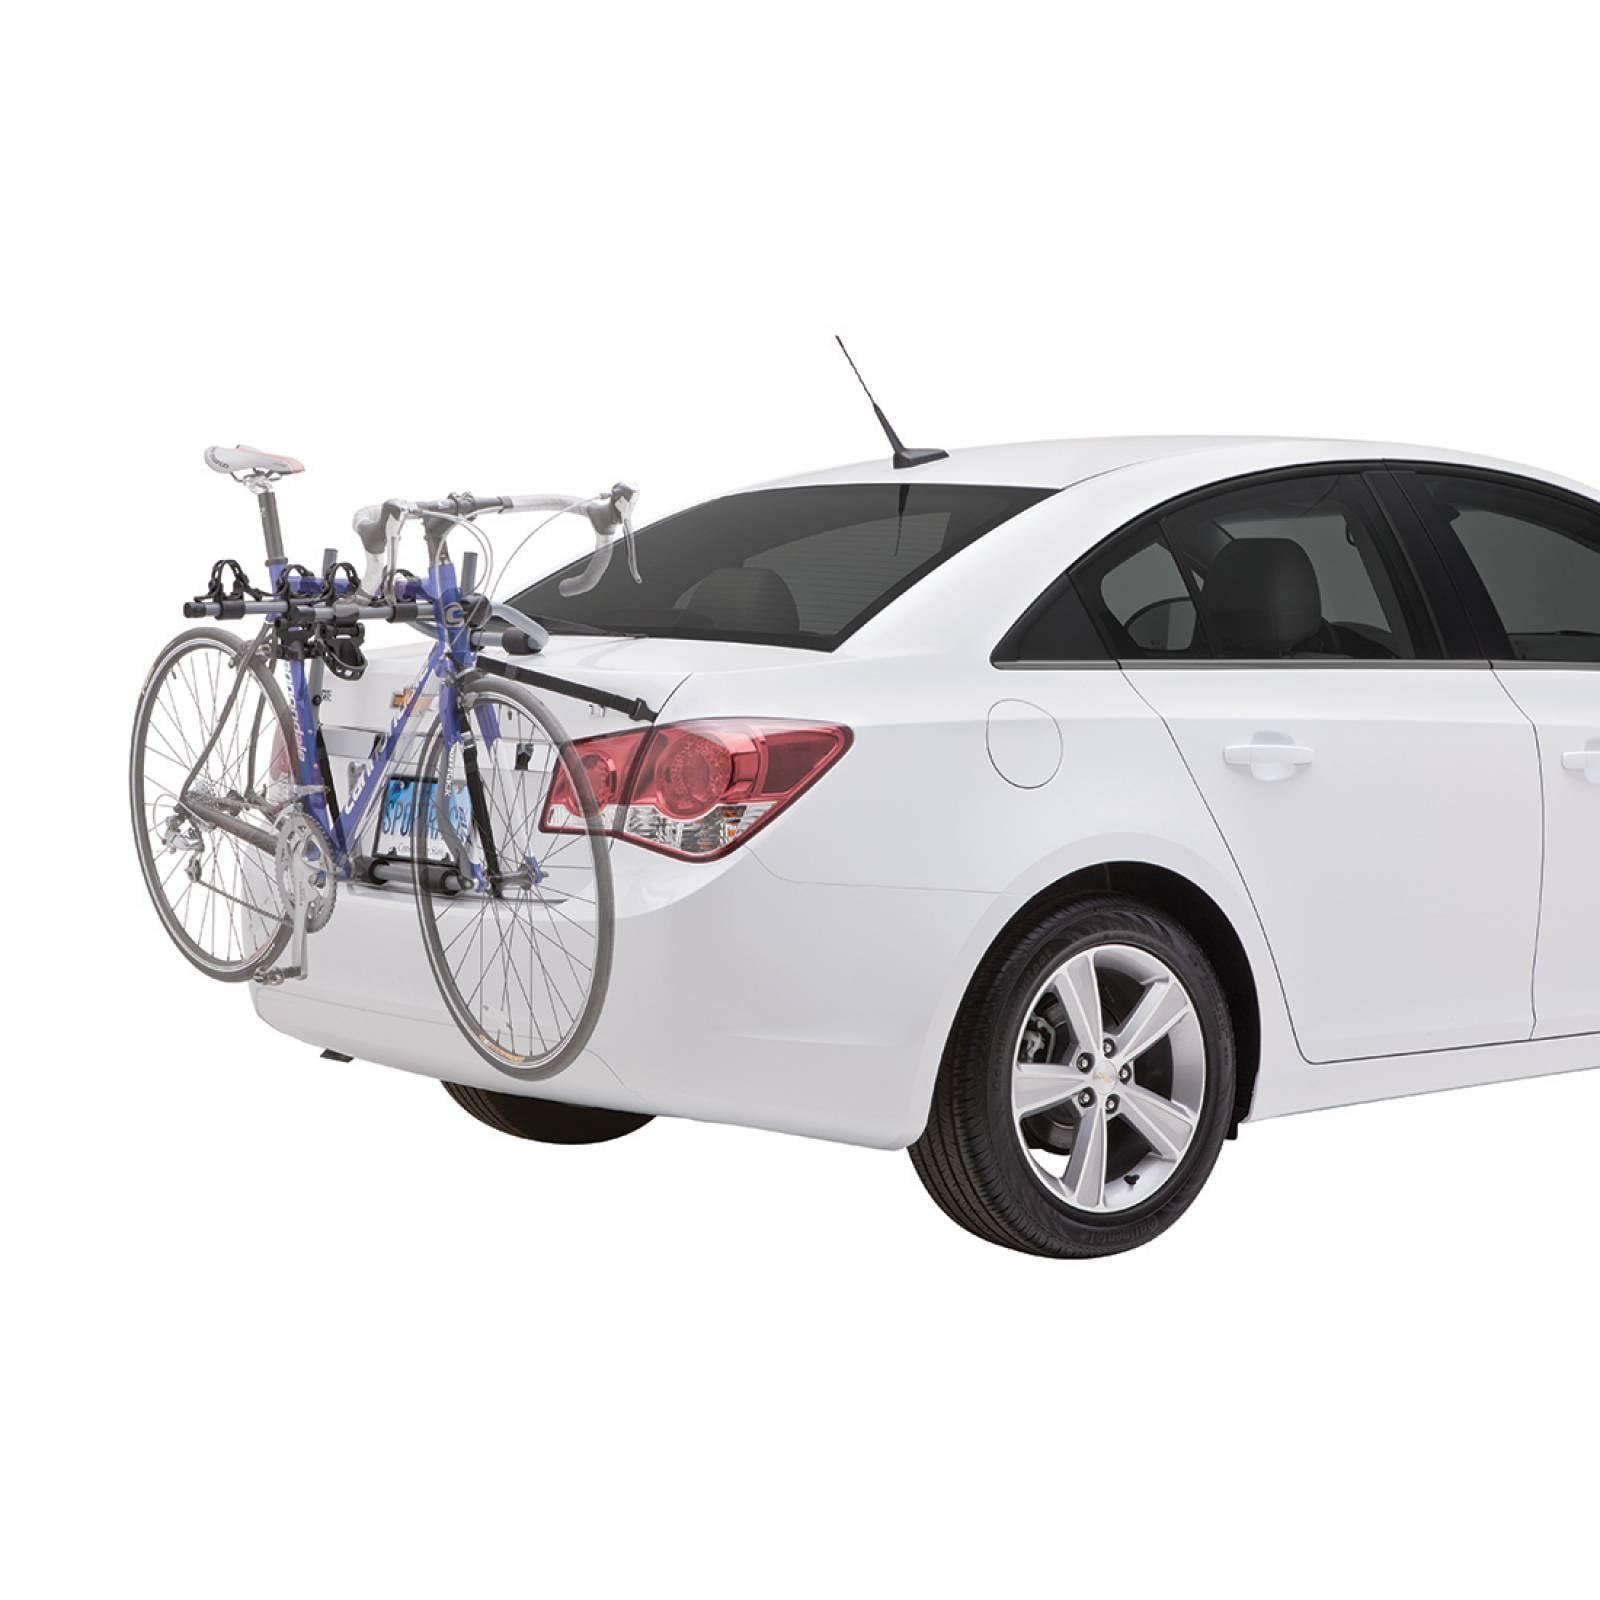 Porta 3 Bicicletas Cajuela Auto Sportrack Max40kg SR3161